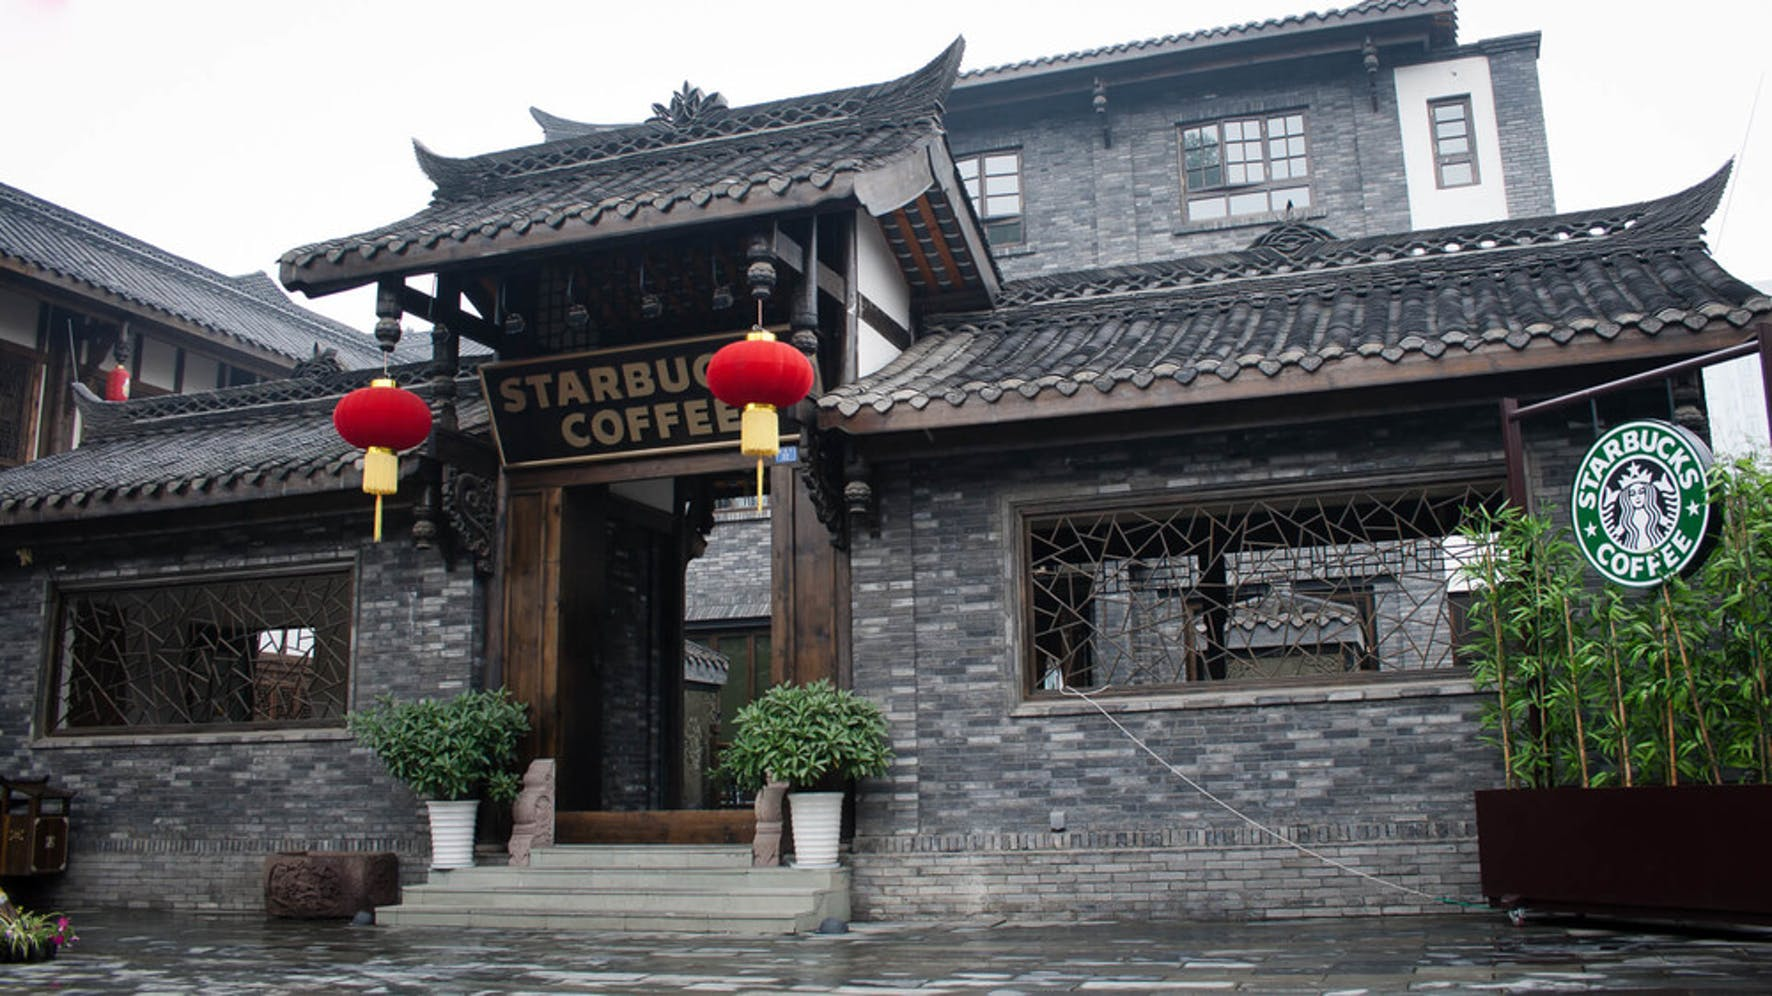 Starbucks in China, Starbucks is part of Stock Index Fund S&P 500.